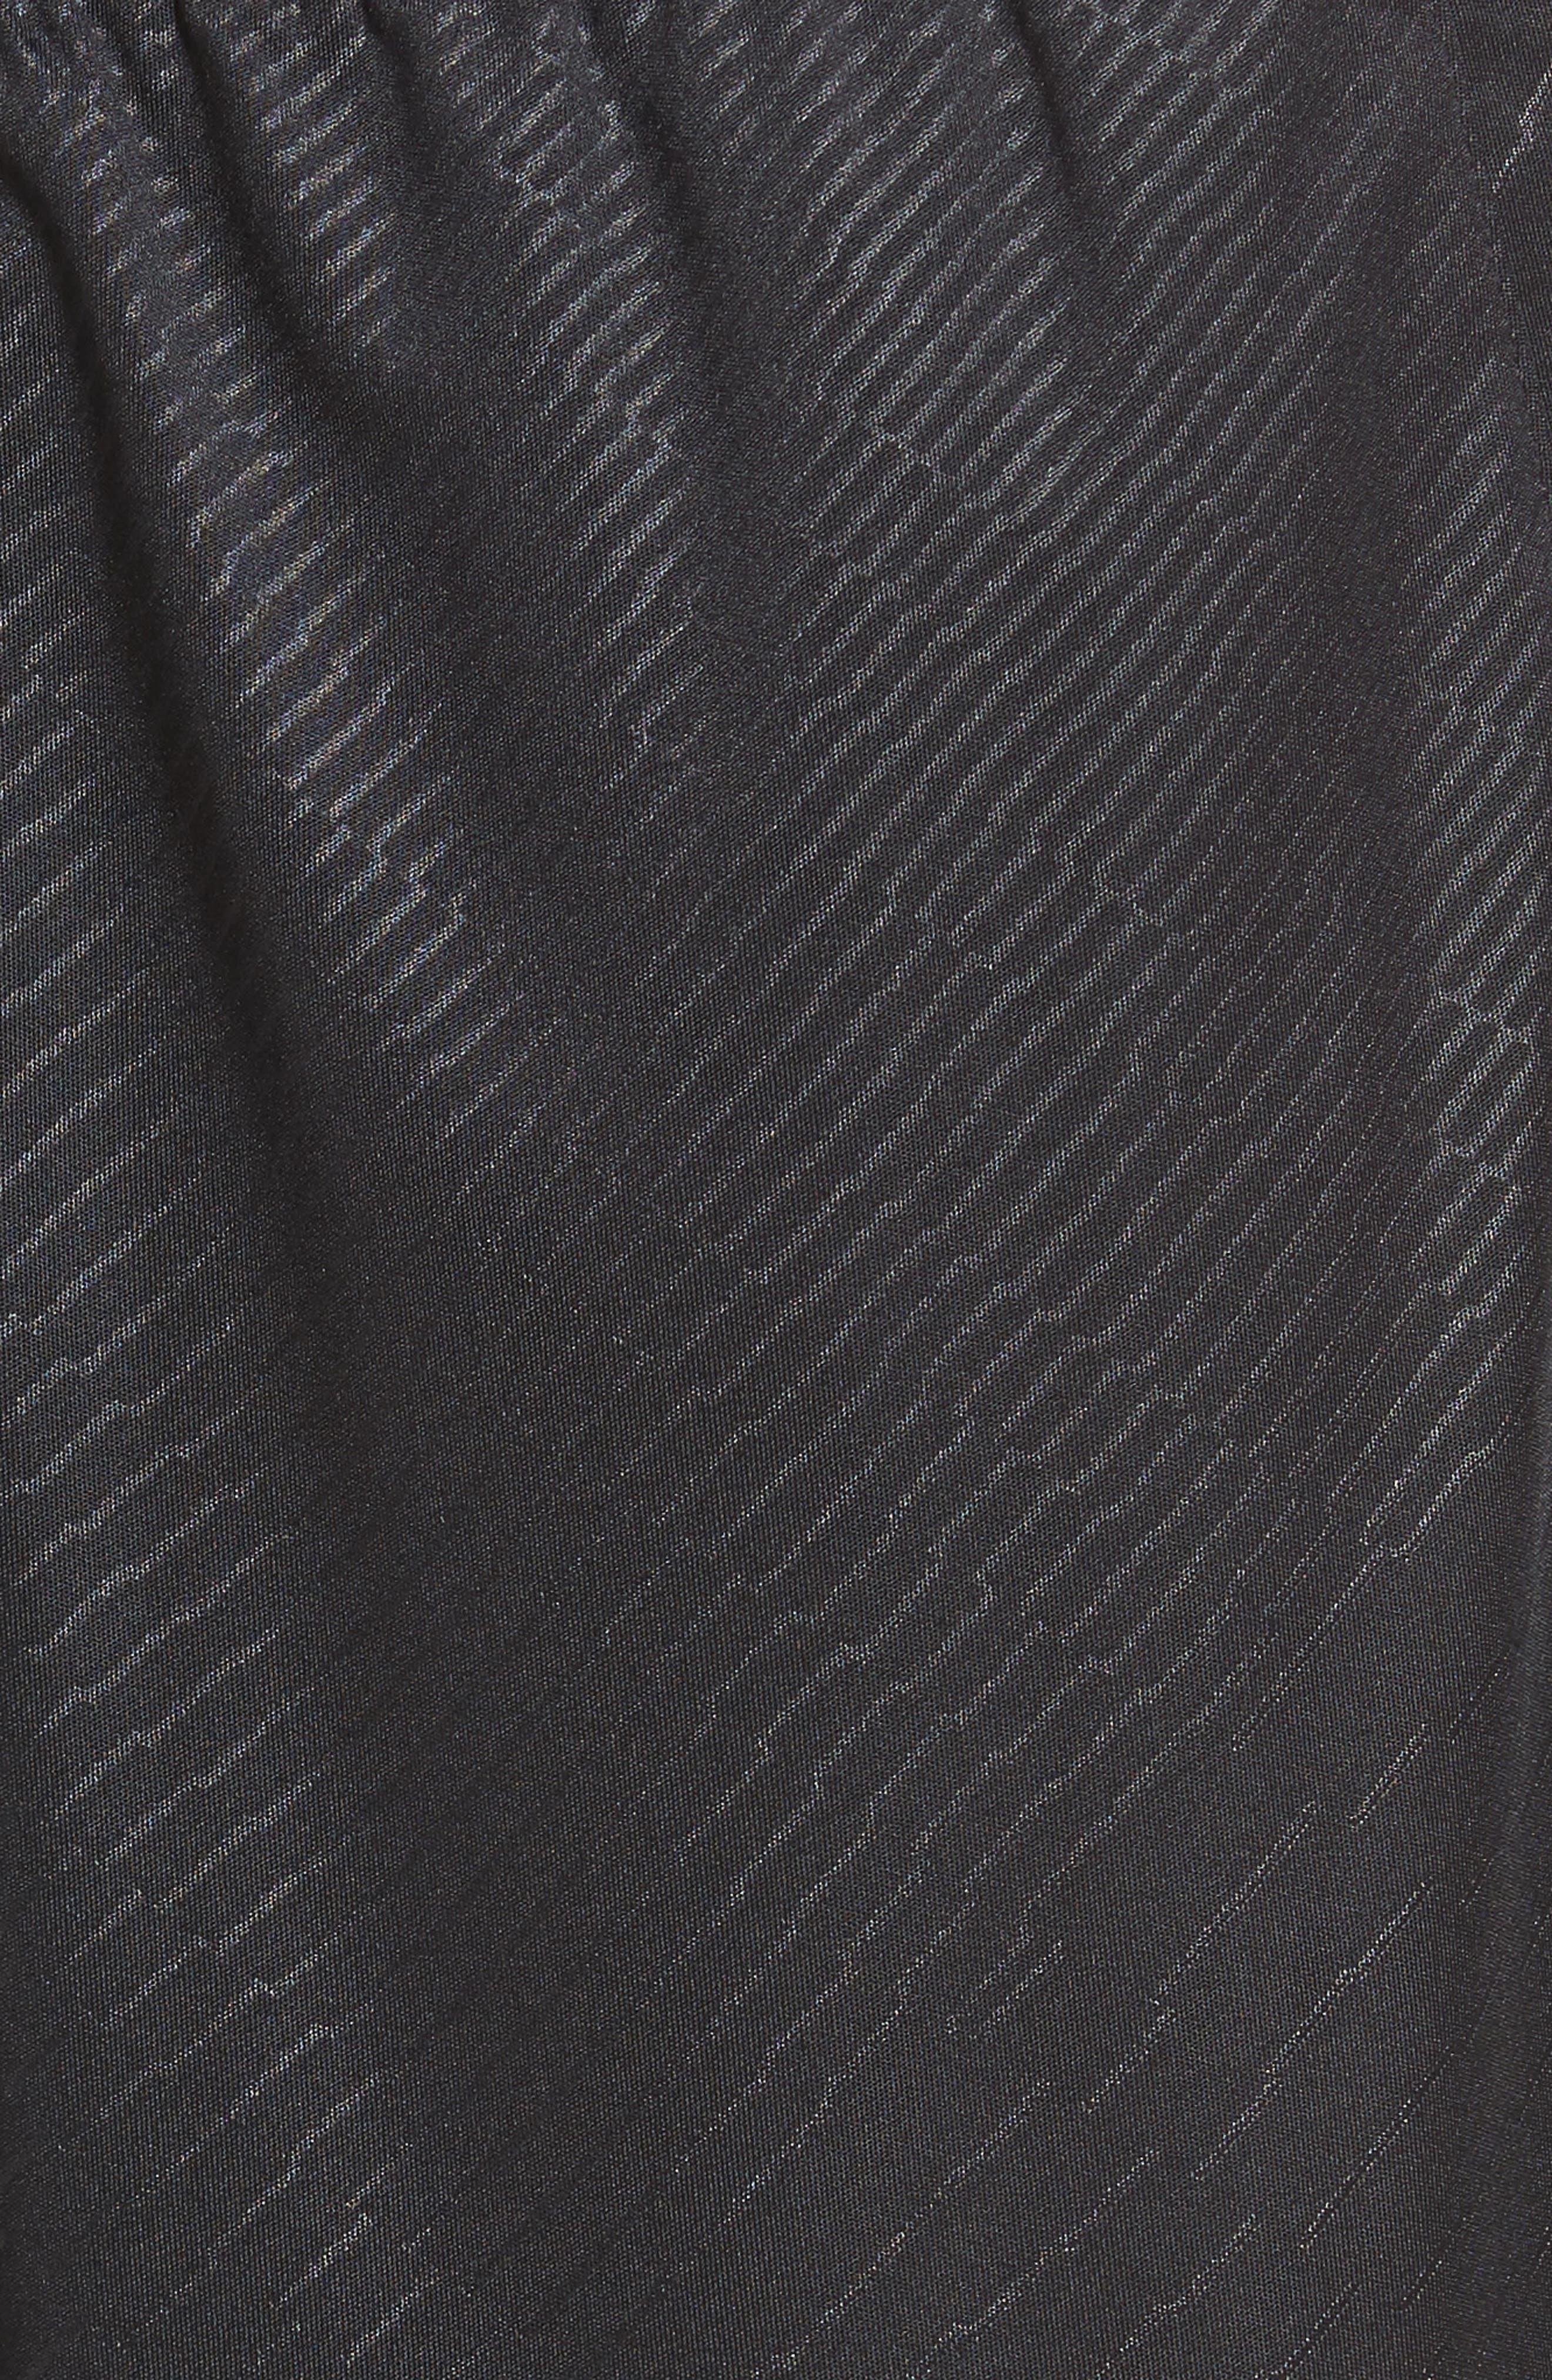 Dry Training Shorts,                             Alternate thumbnail 5, color,                             010